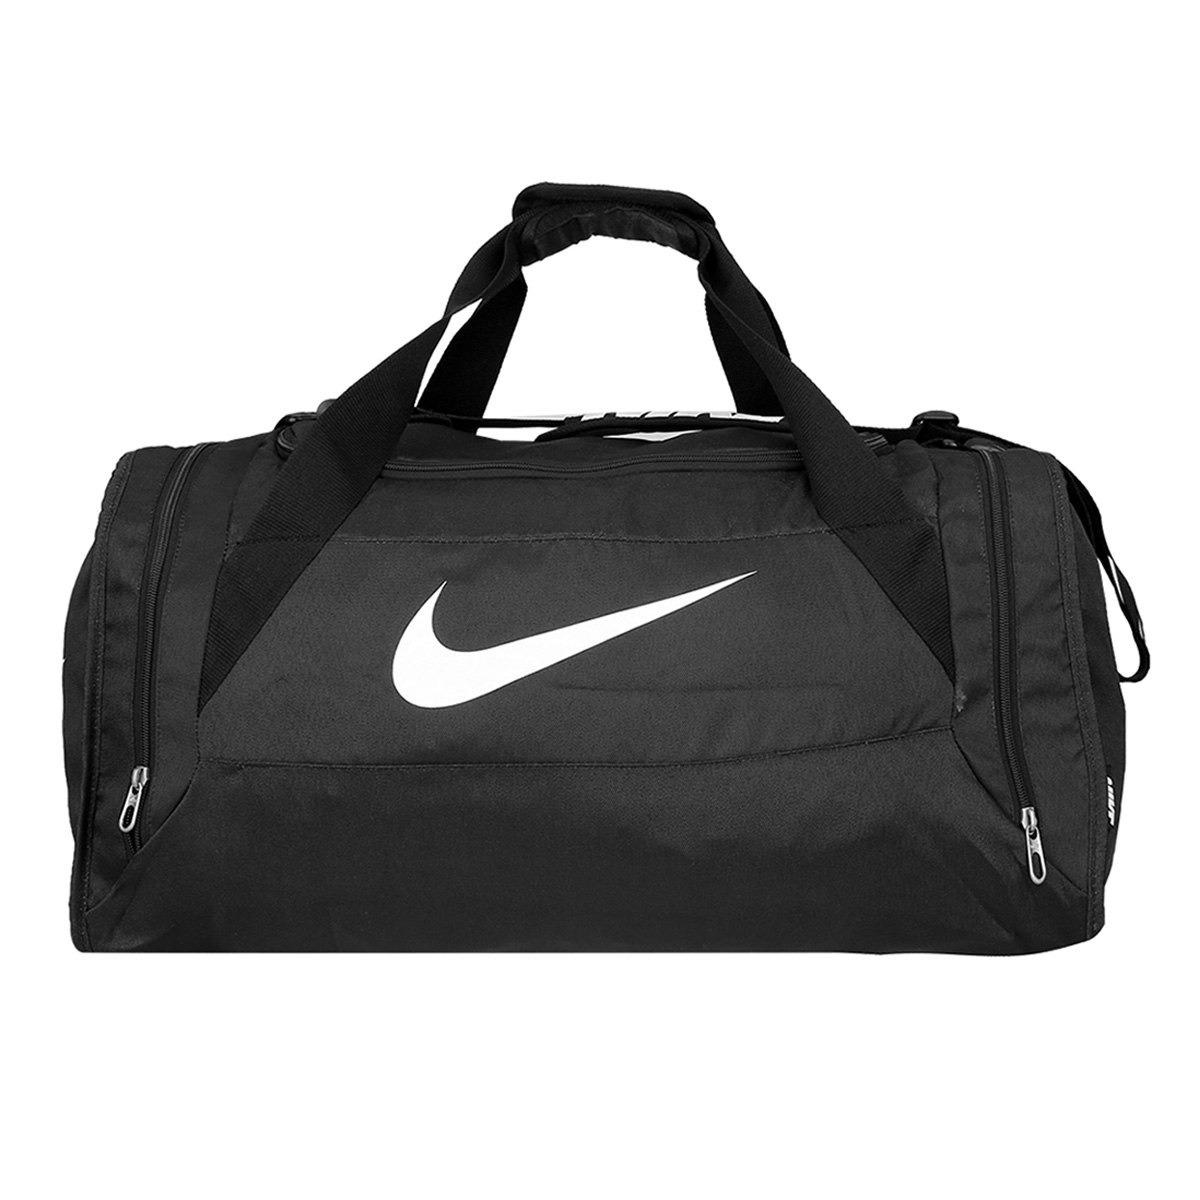 Bolso Mercado 100 Nike Libre 00 Negro 1 En AxqvzwAUr